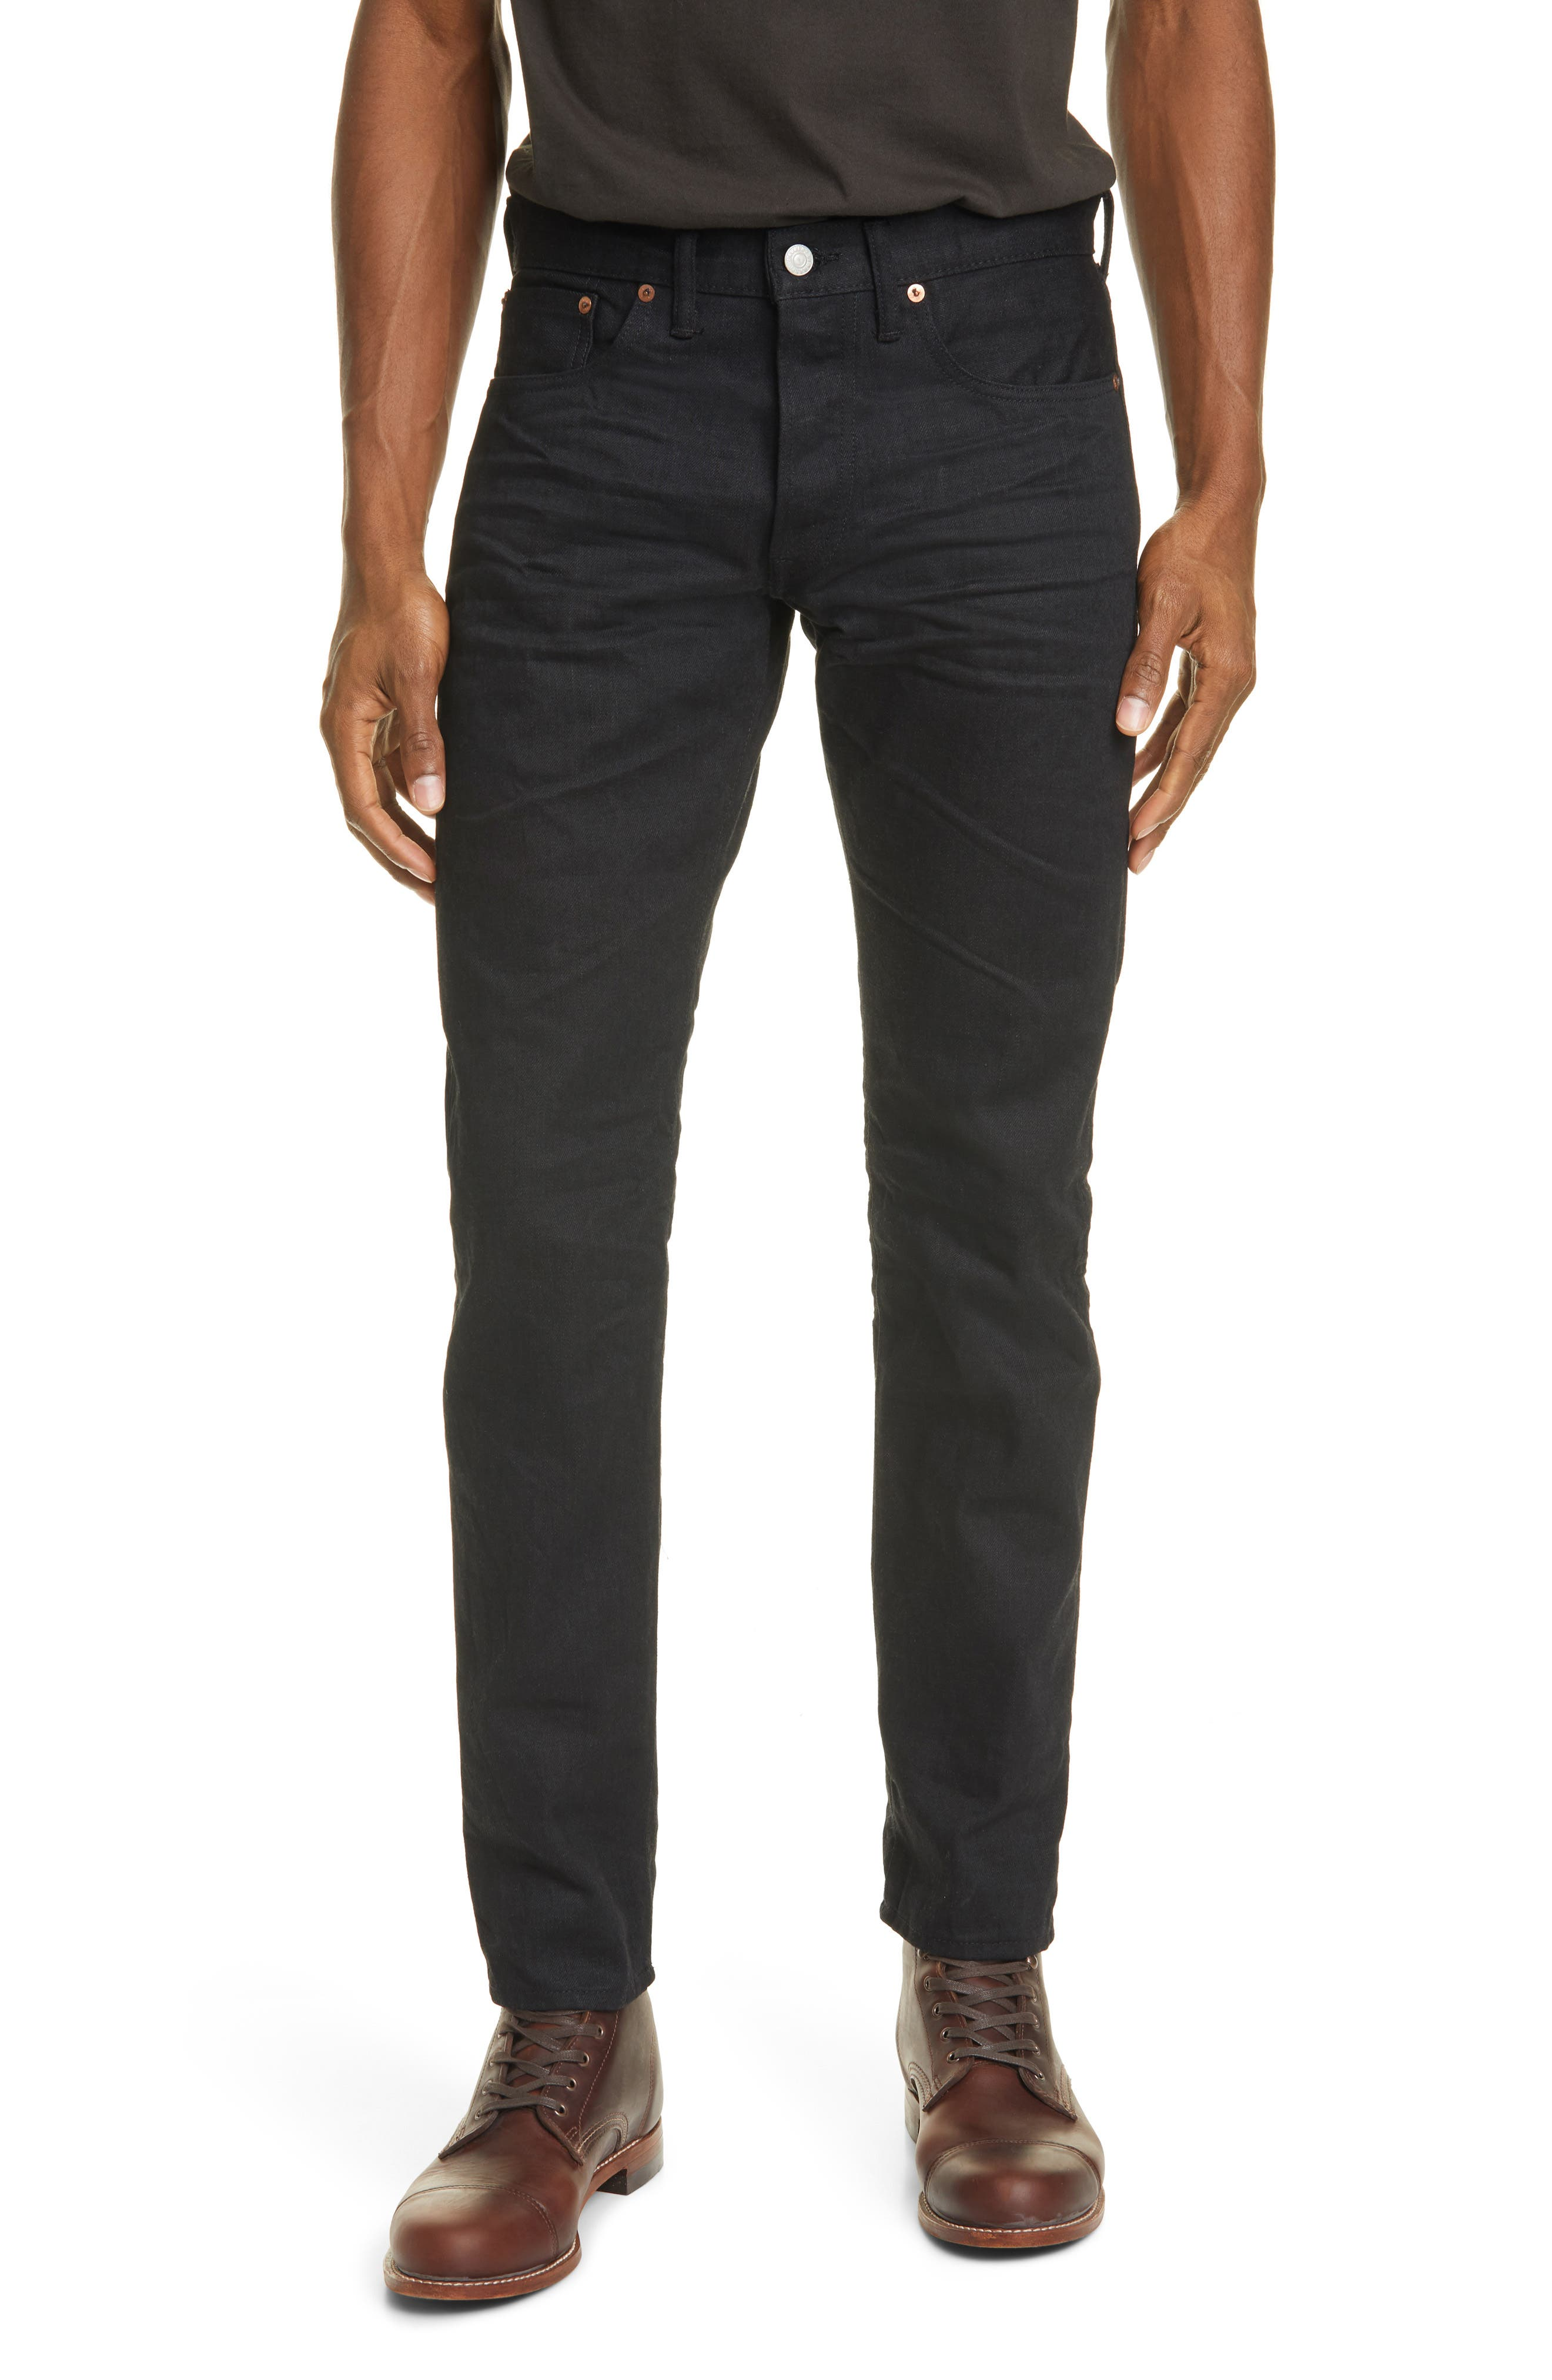 Men's Rrl Slim Fit Selvedge Jeans,  33 x 32 - Black